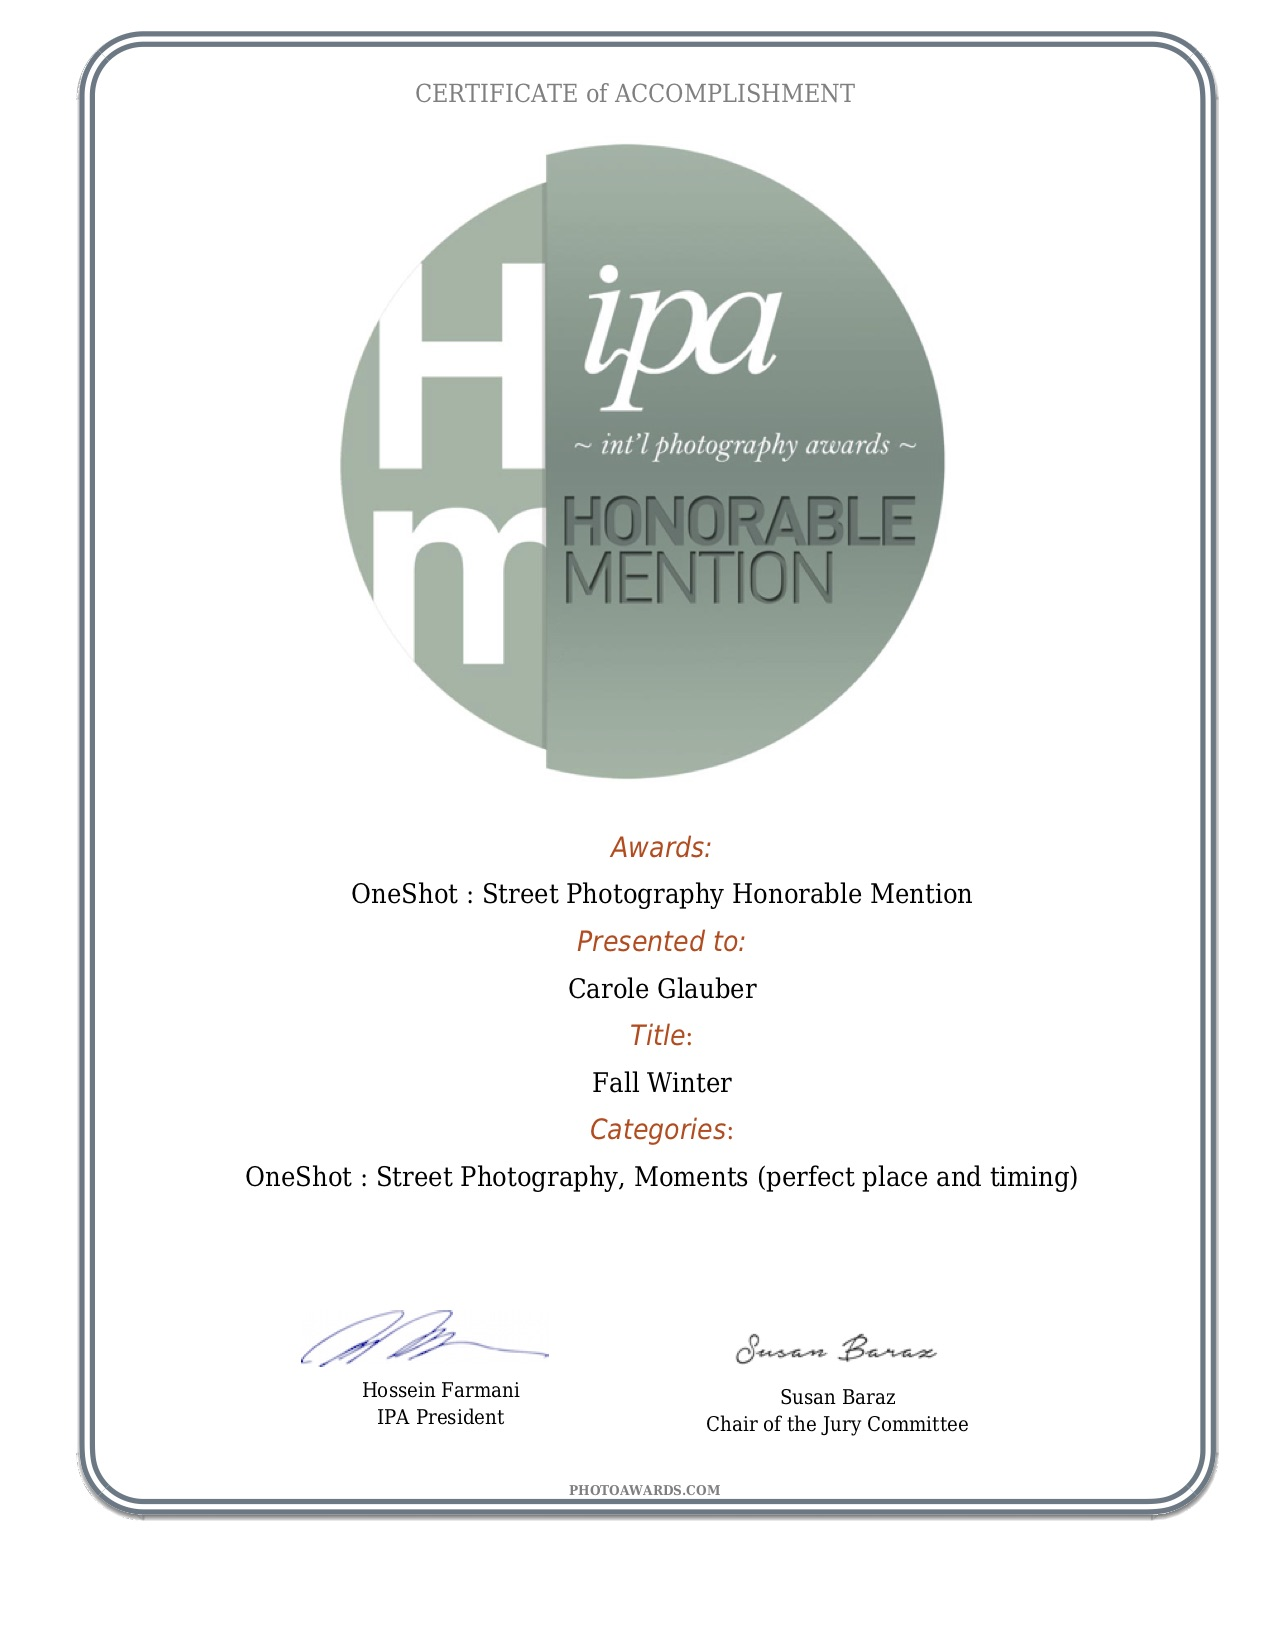 IPA certificate 2.jpg